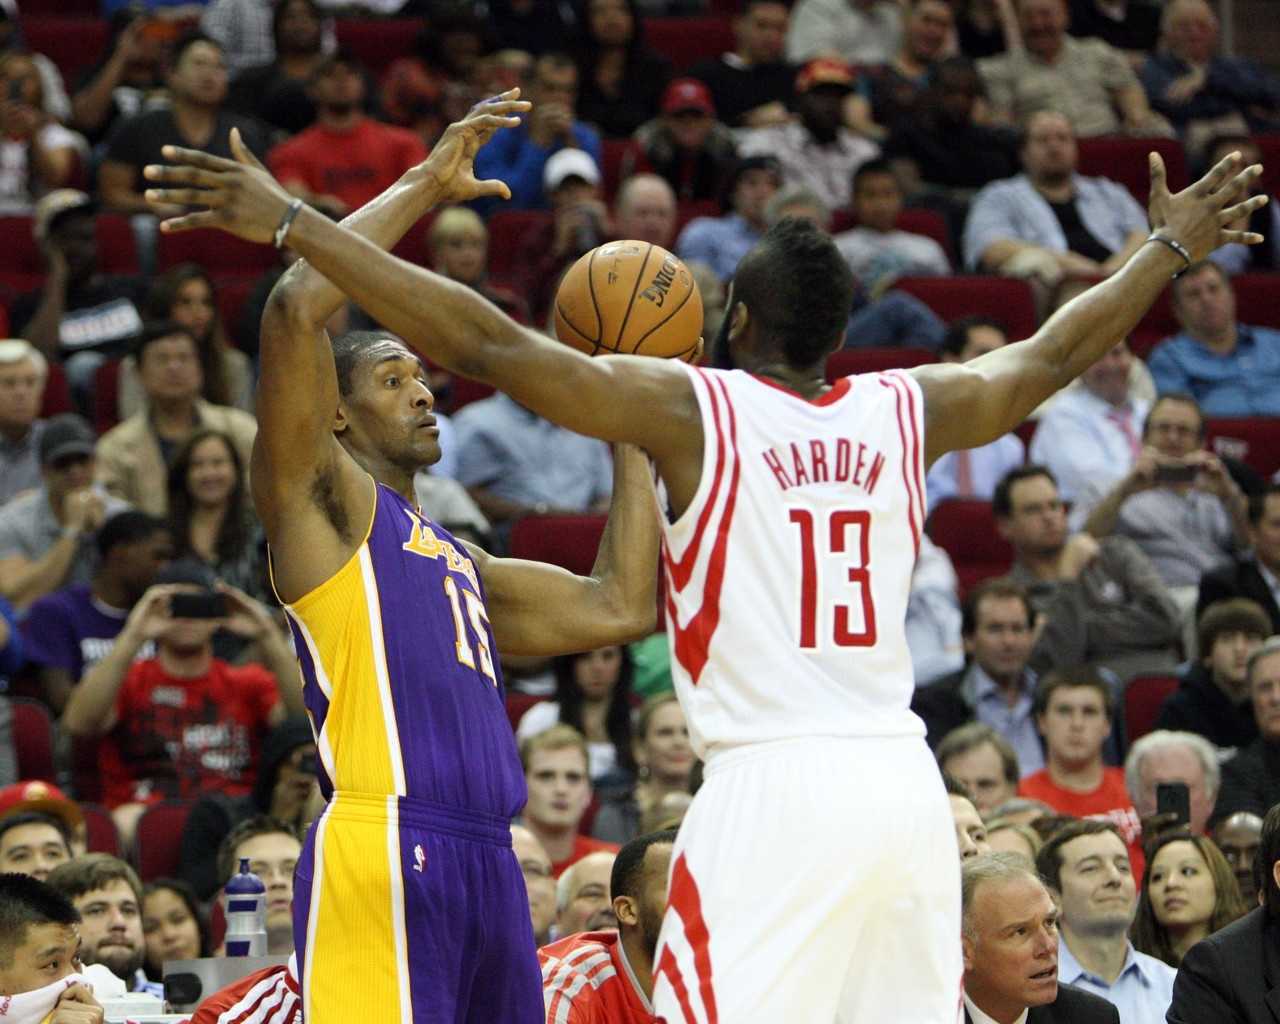 NBA季后赛已经开启第35天左右,其中湖人名宿慈世平公开力挺